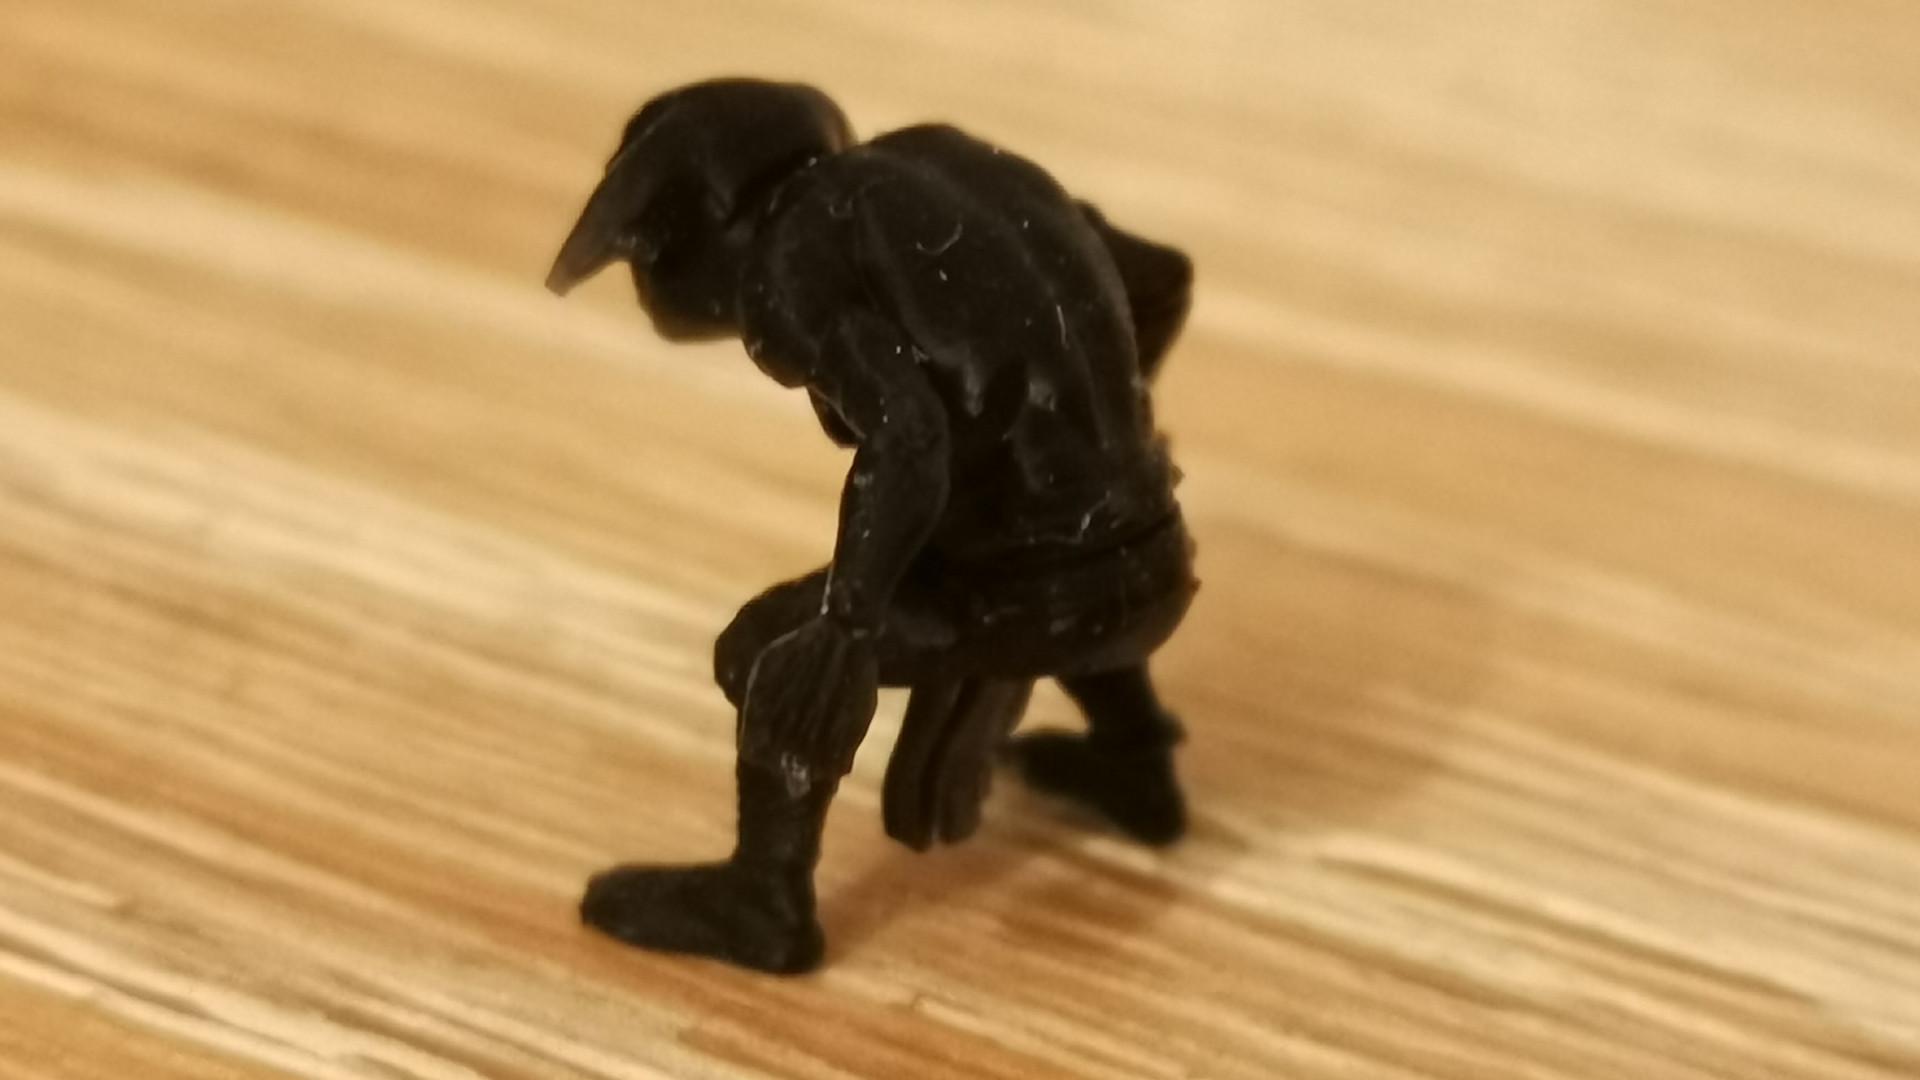 A tiny goblin figurine printed on the Elegoo Saturn